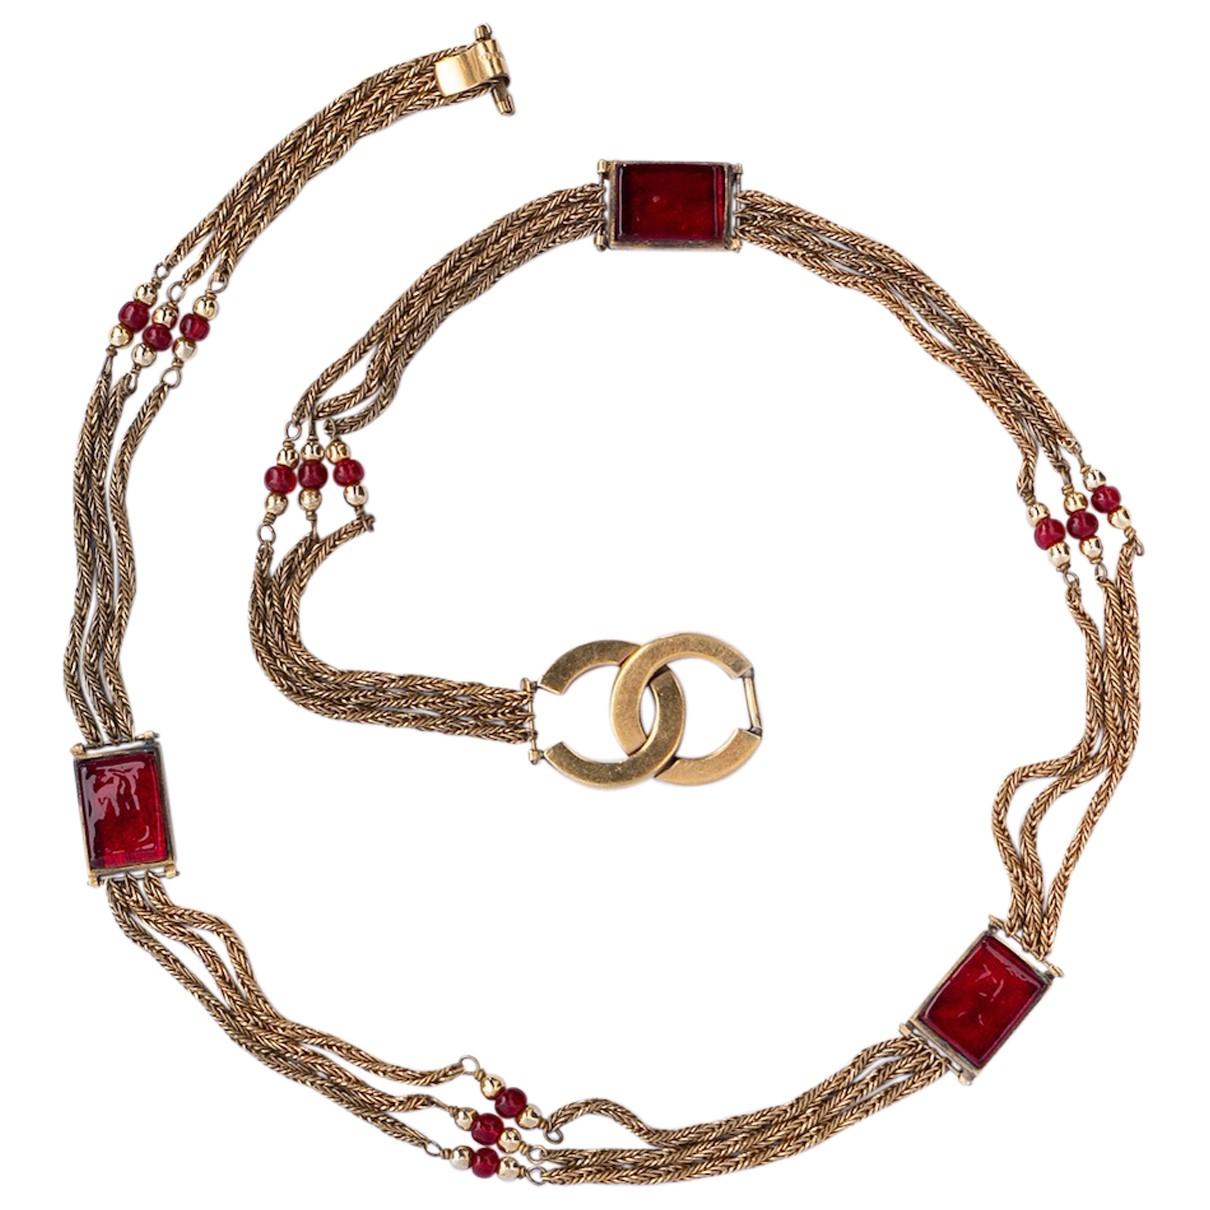 Chanel N Gold Metal belt for Women 70 cm